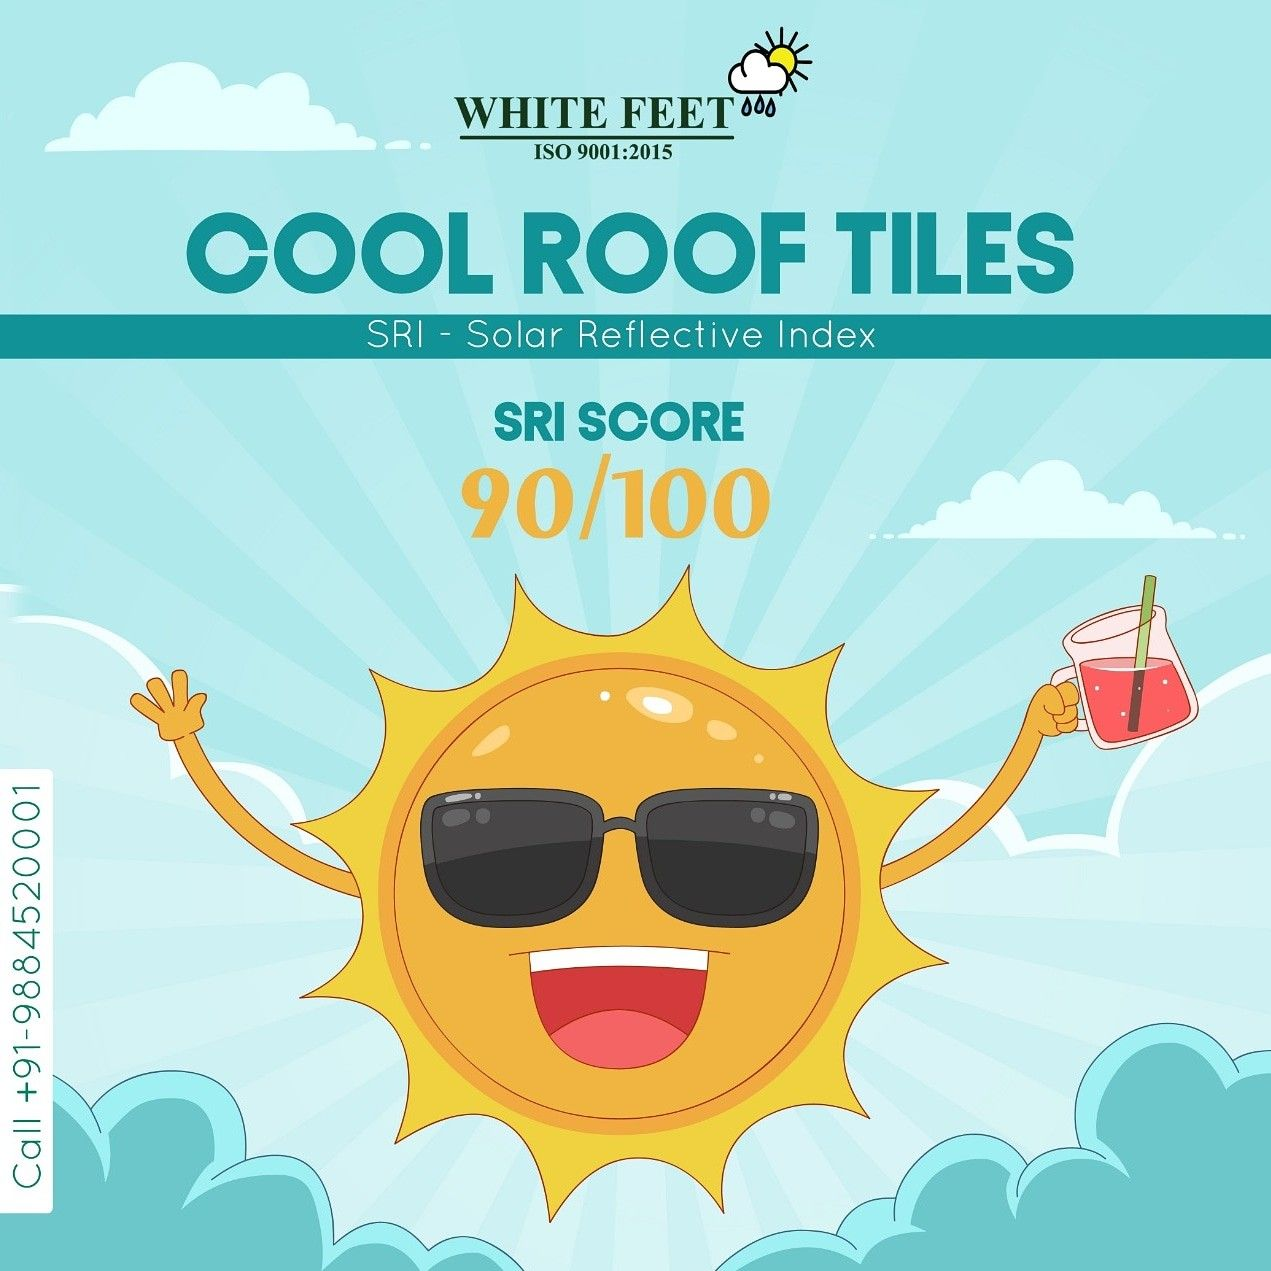 Sri Roof Tiles Cool Roof Roof Tiles Roof